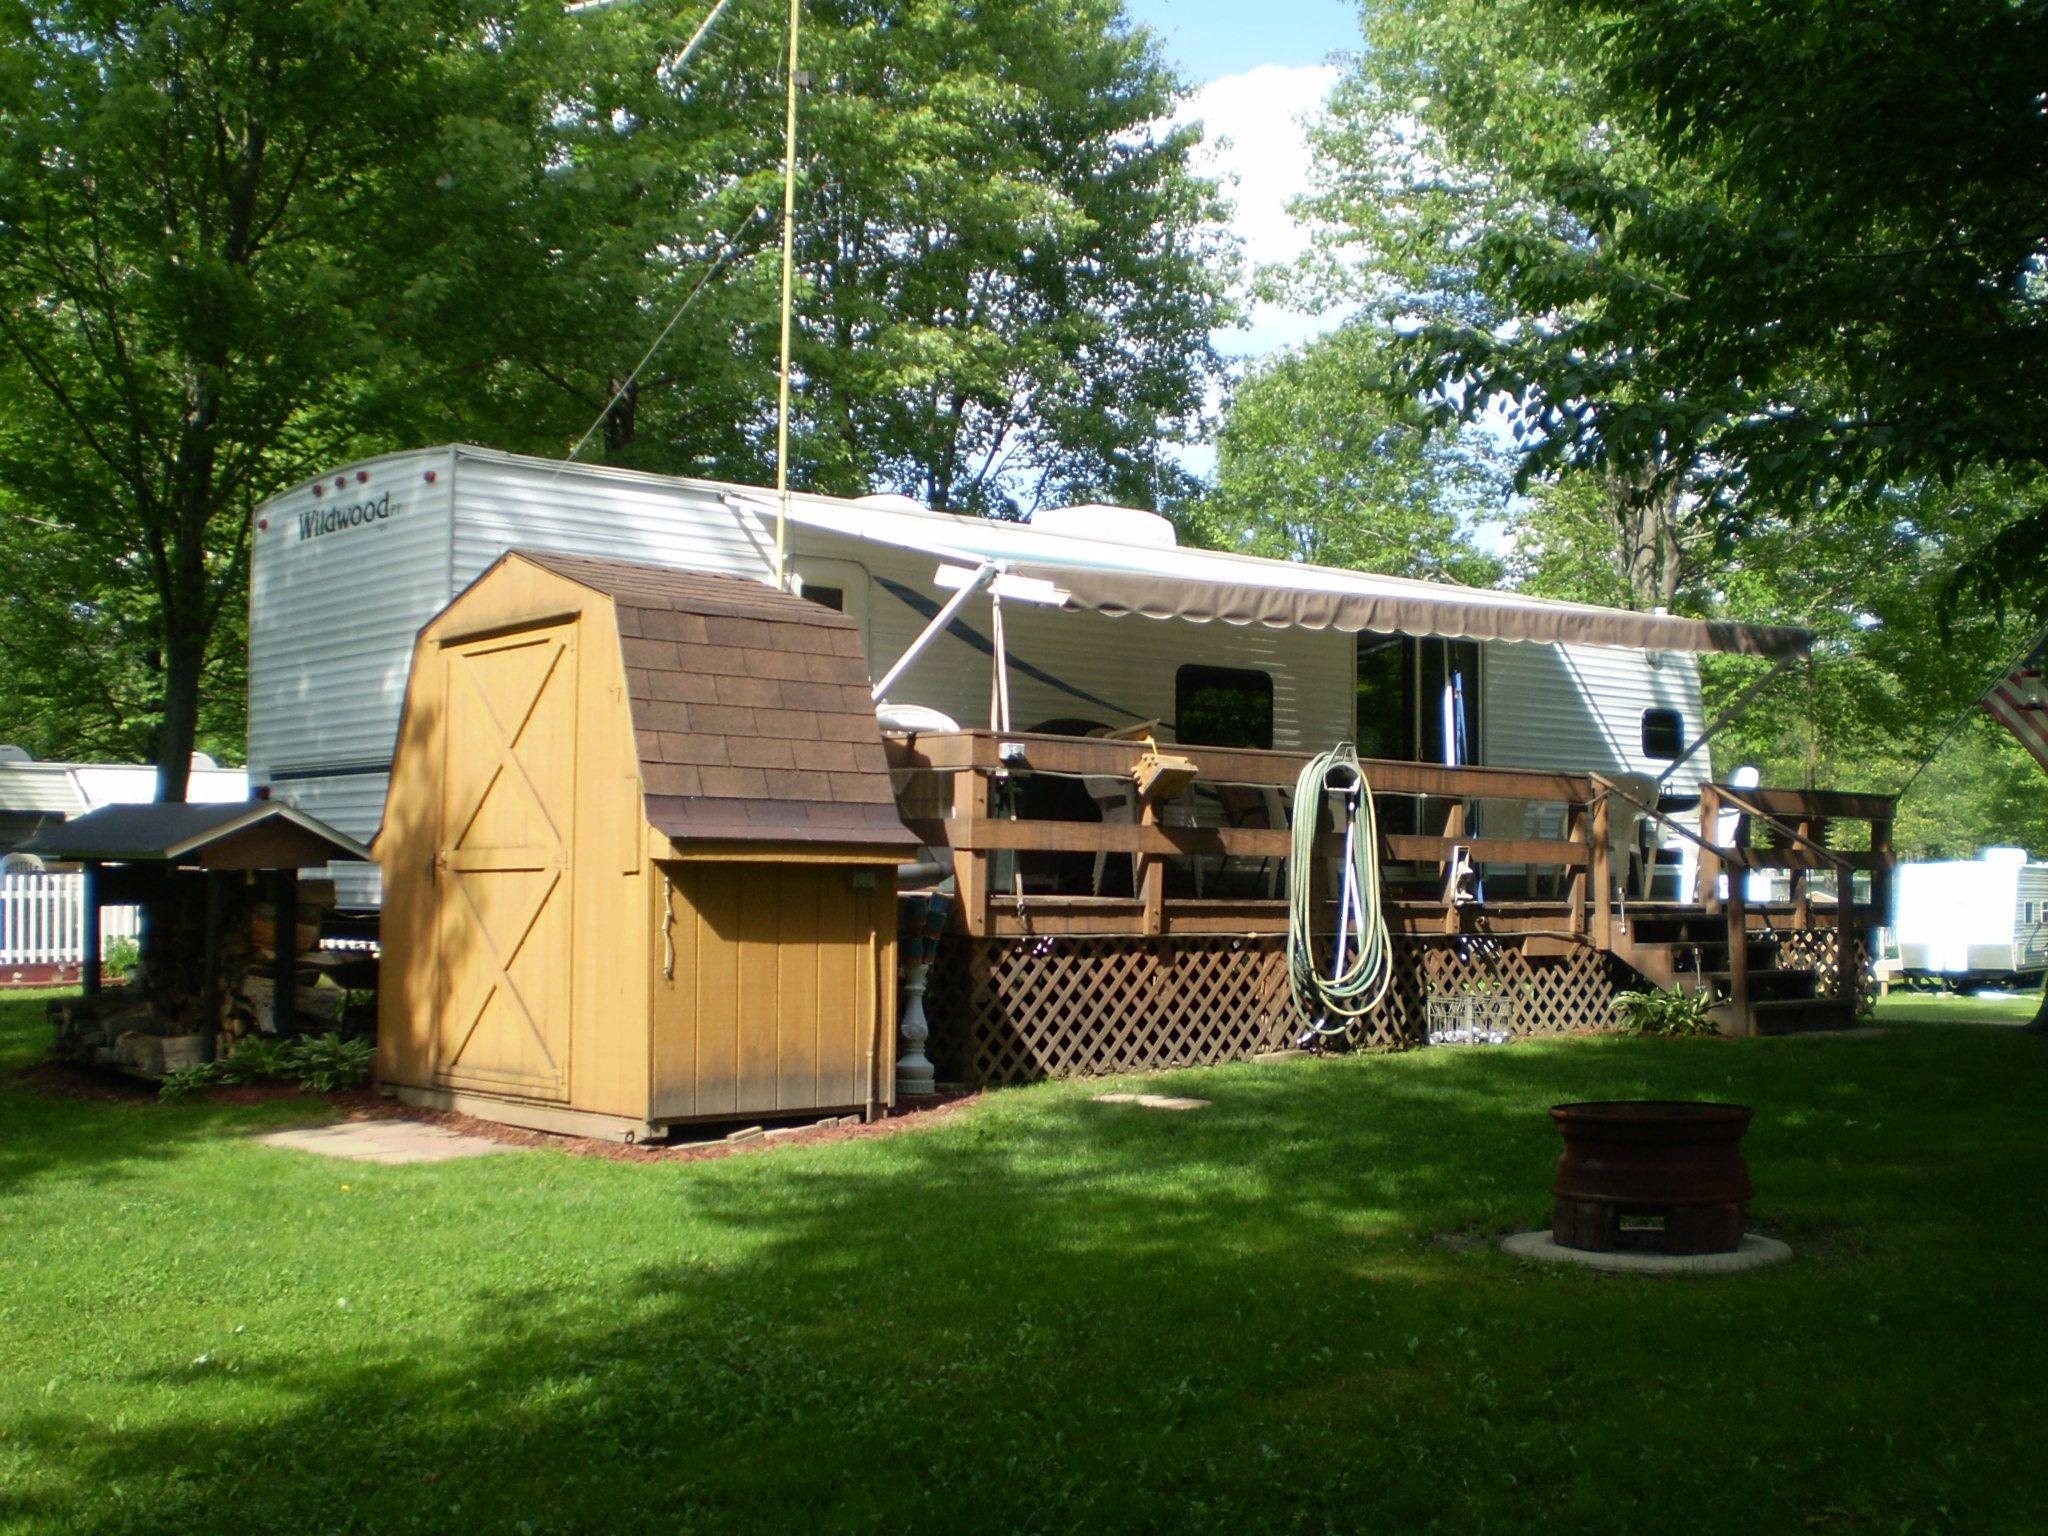 148 Best Images About Seasonal Campsite Ideas